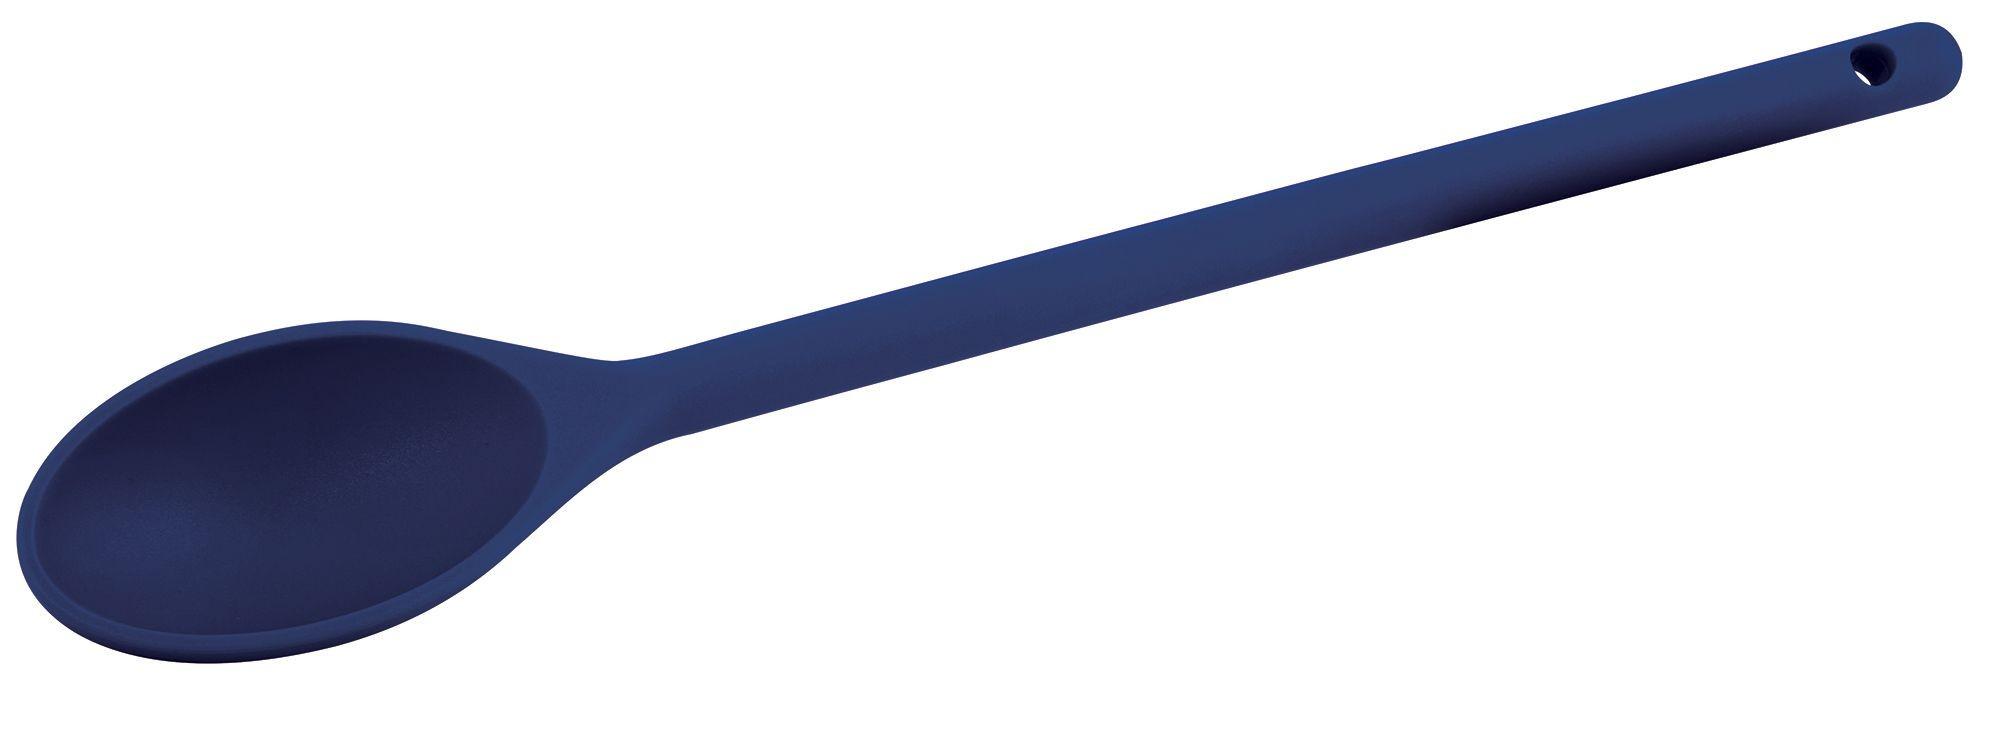 "Winco NS-12B Blue Nylon Heat Resistant Spoon, 12"""